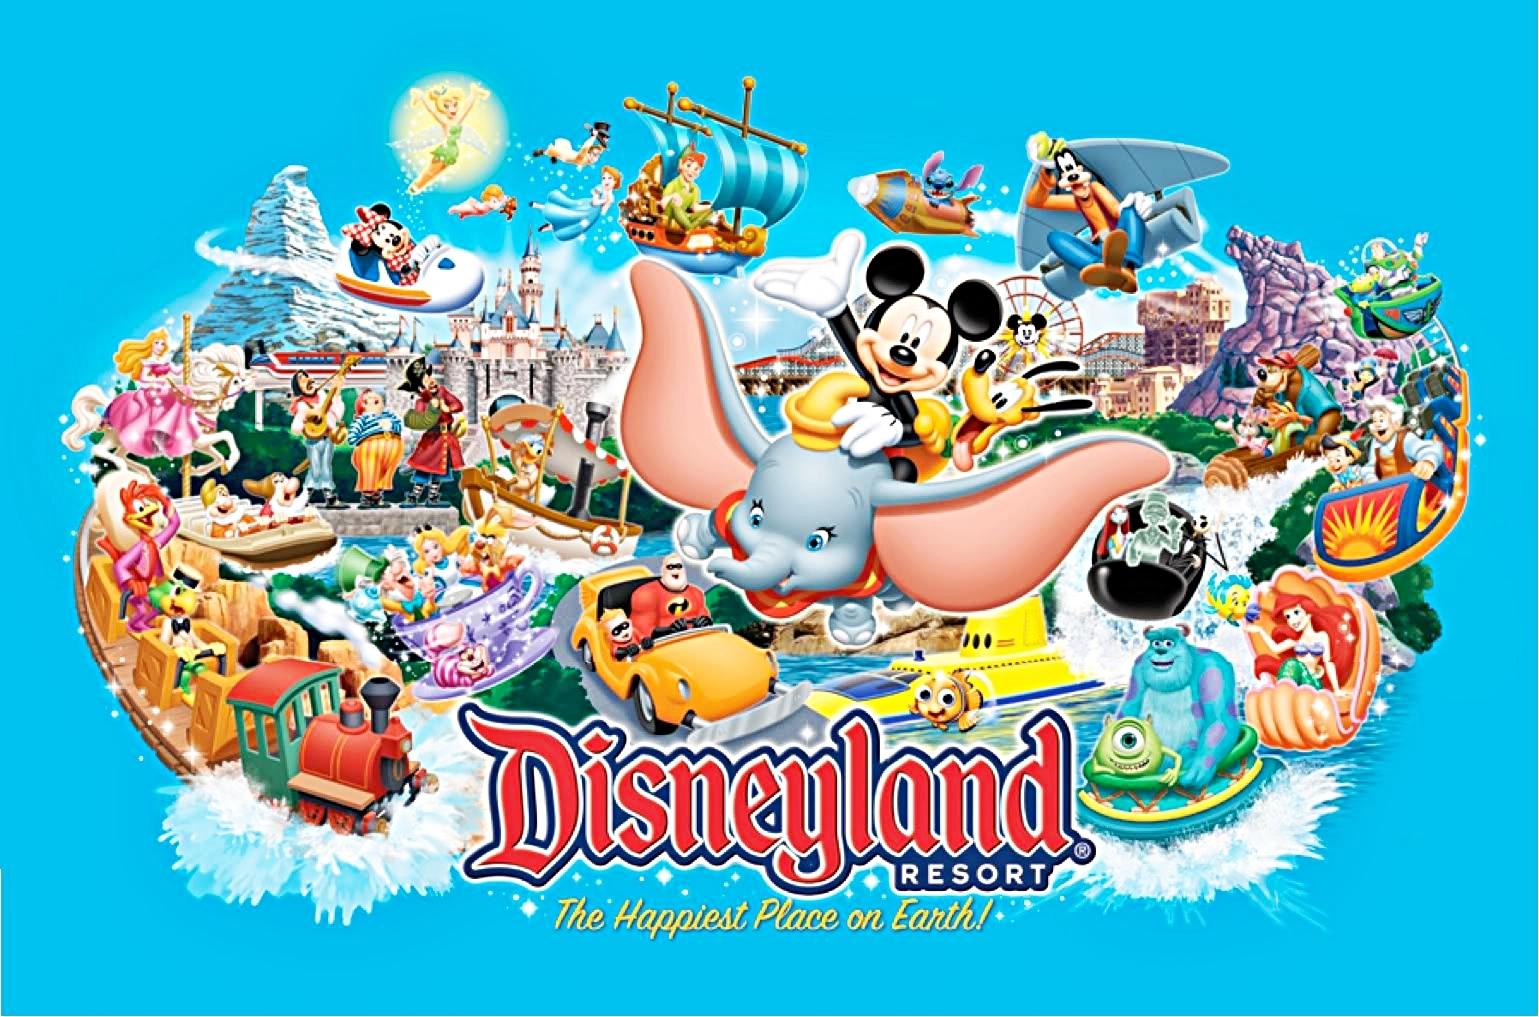 Free Disney Summer Wallpaper: Comparing Disneyland Resorts